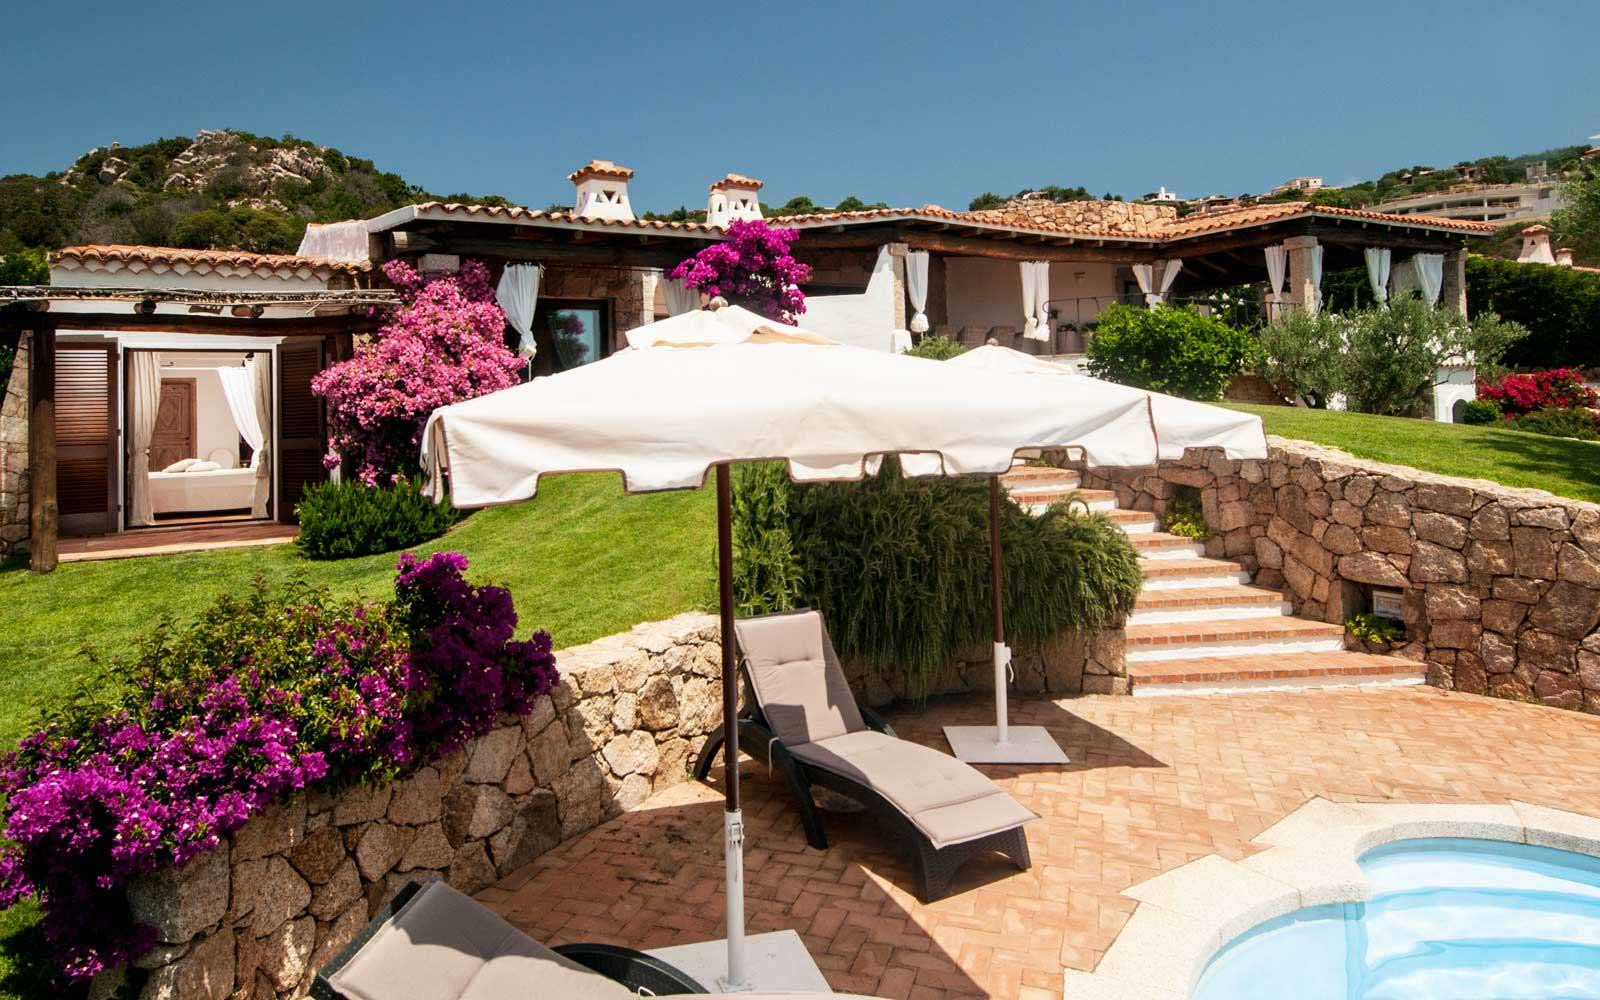 Villa Luna: room / property / locale photo. Image 2